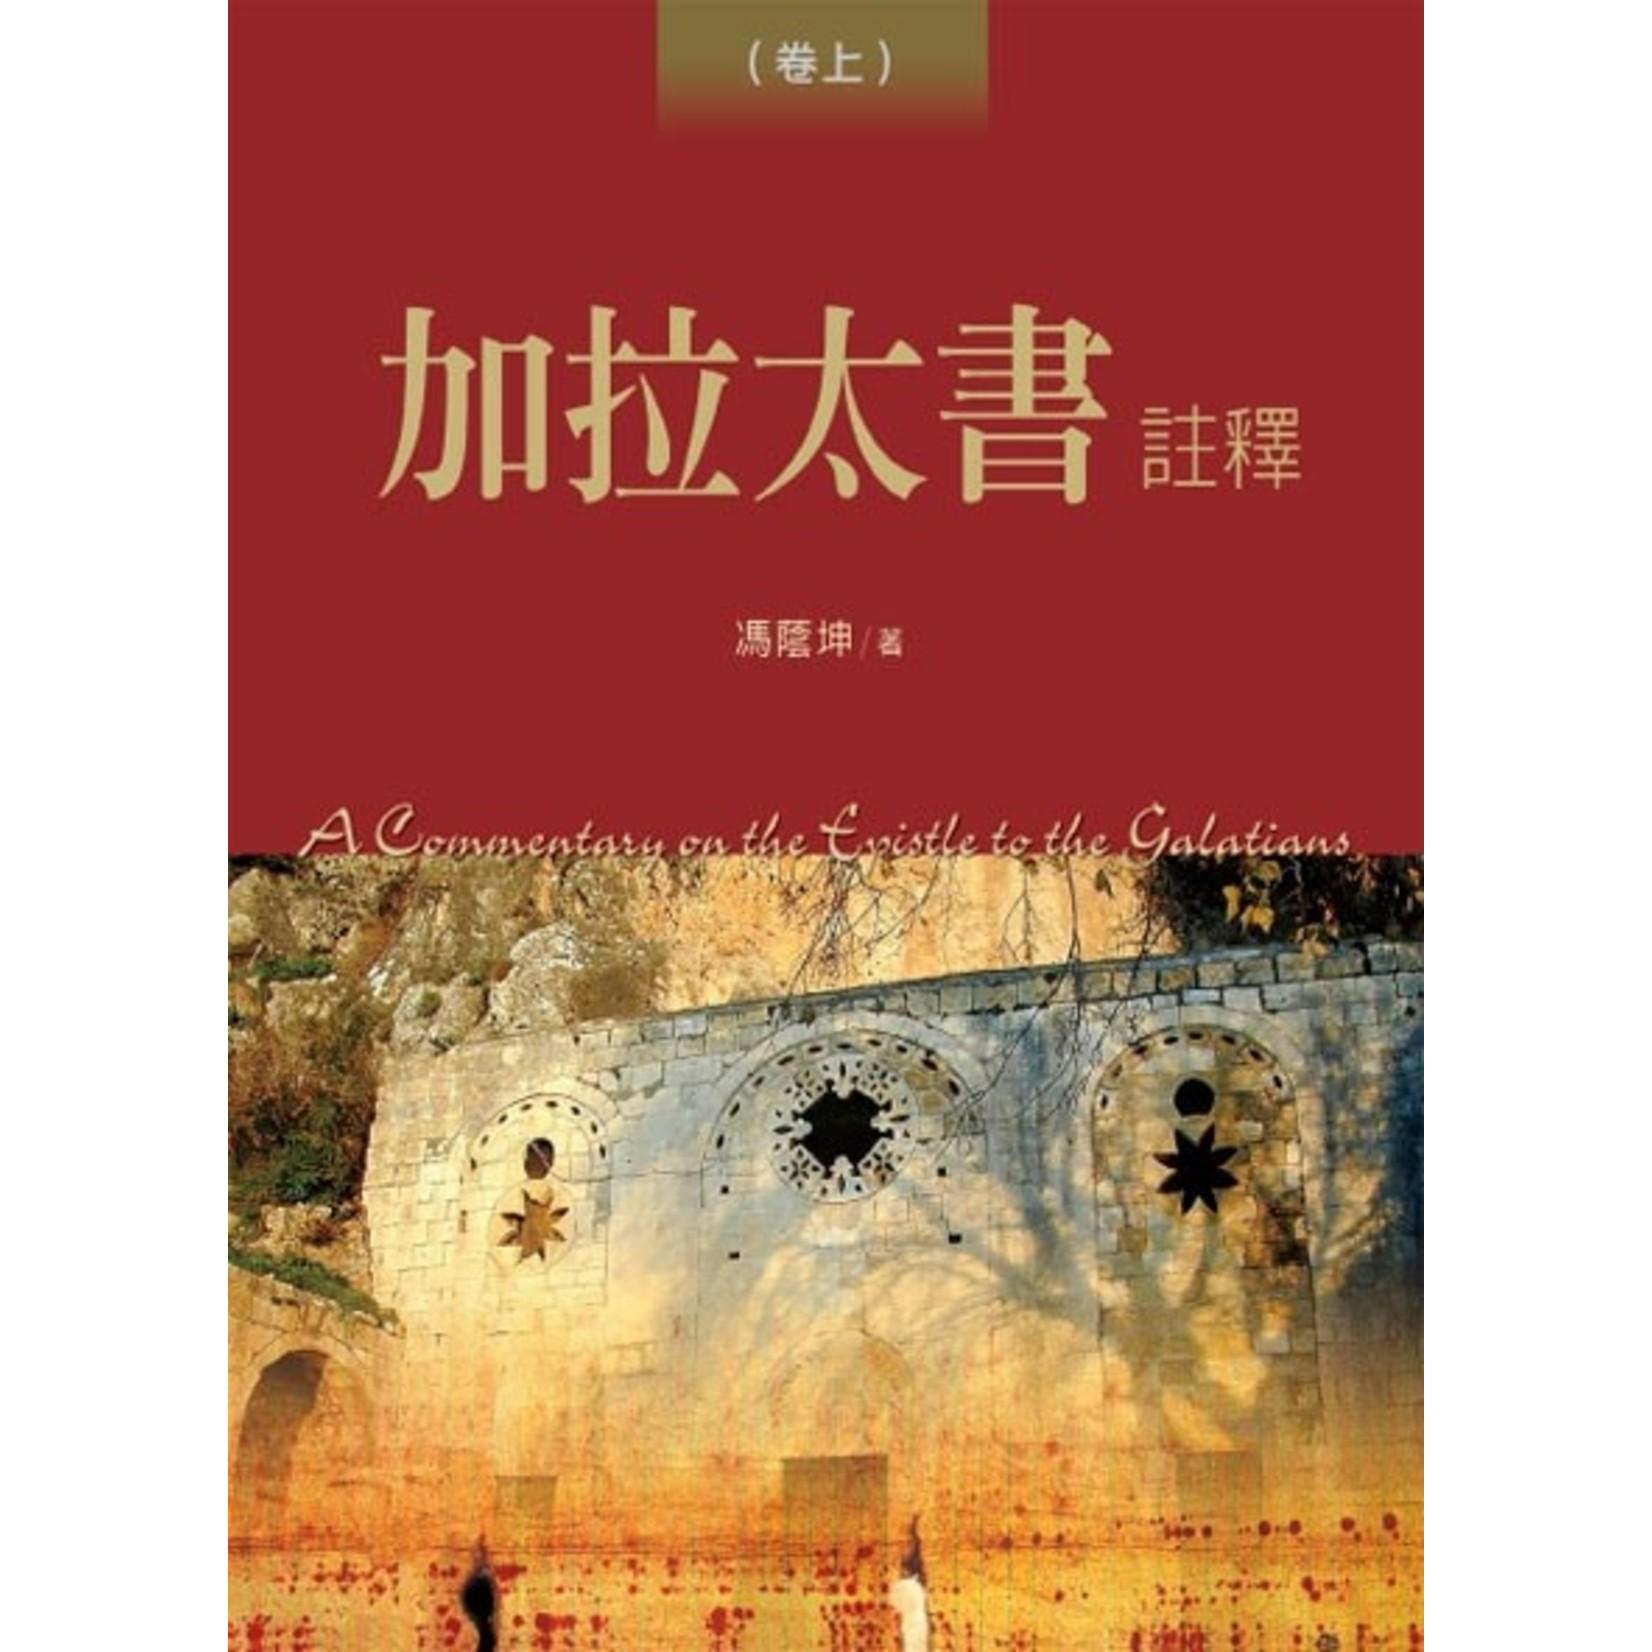 校園書房 Campus Books 加拉太書註釋(上下冊)(精裝) A Commentary on Epistle to the Galatians